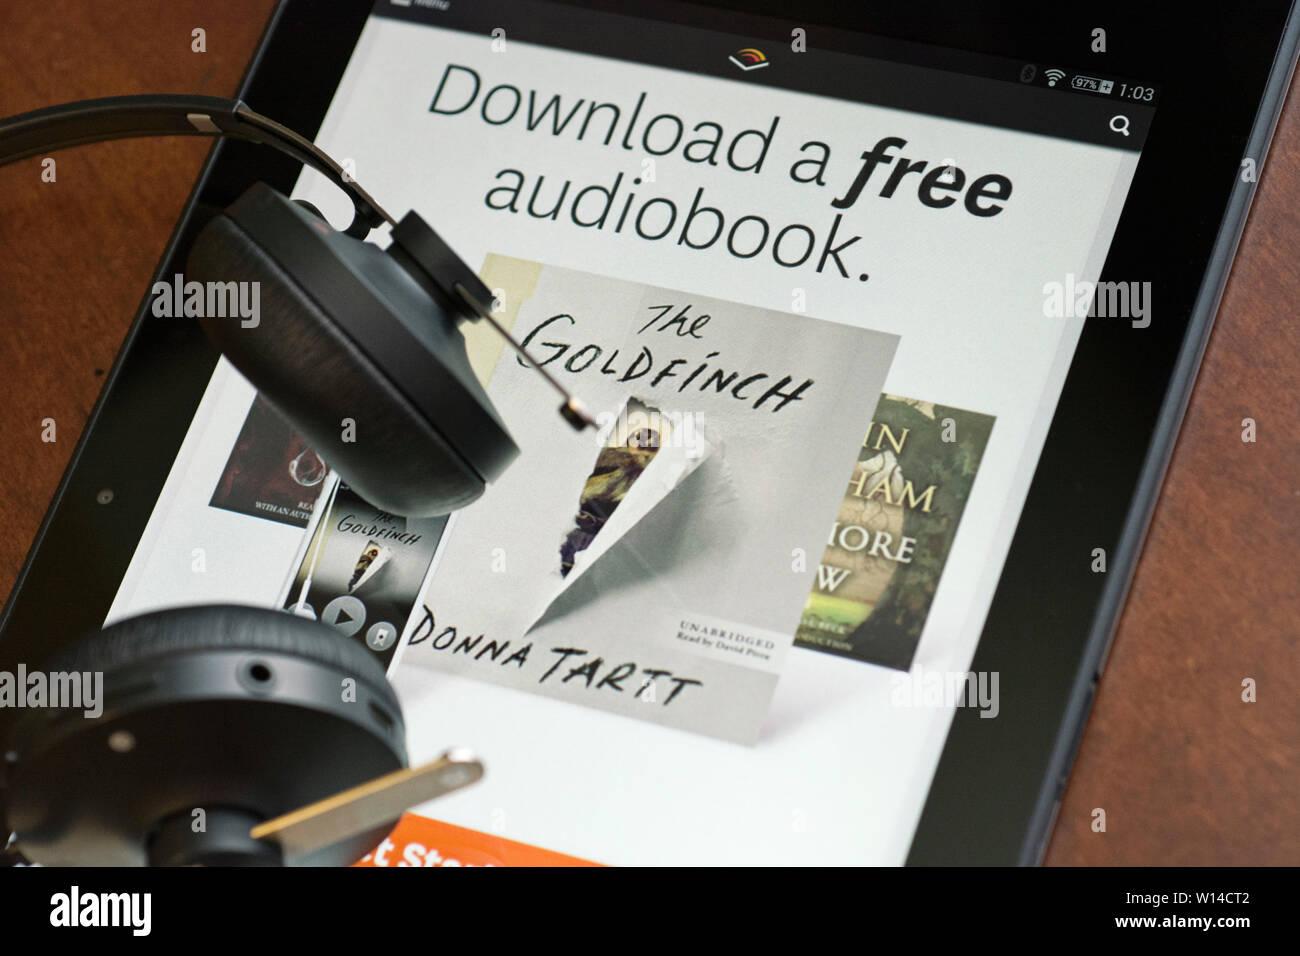 Audiobook Stock Photos & Audiobook Stock Images - Alamy